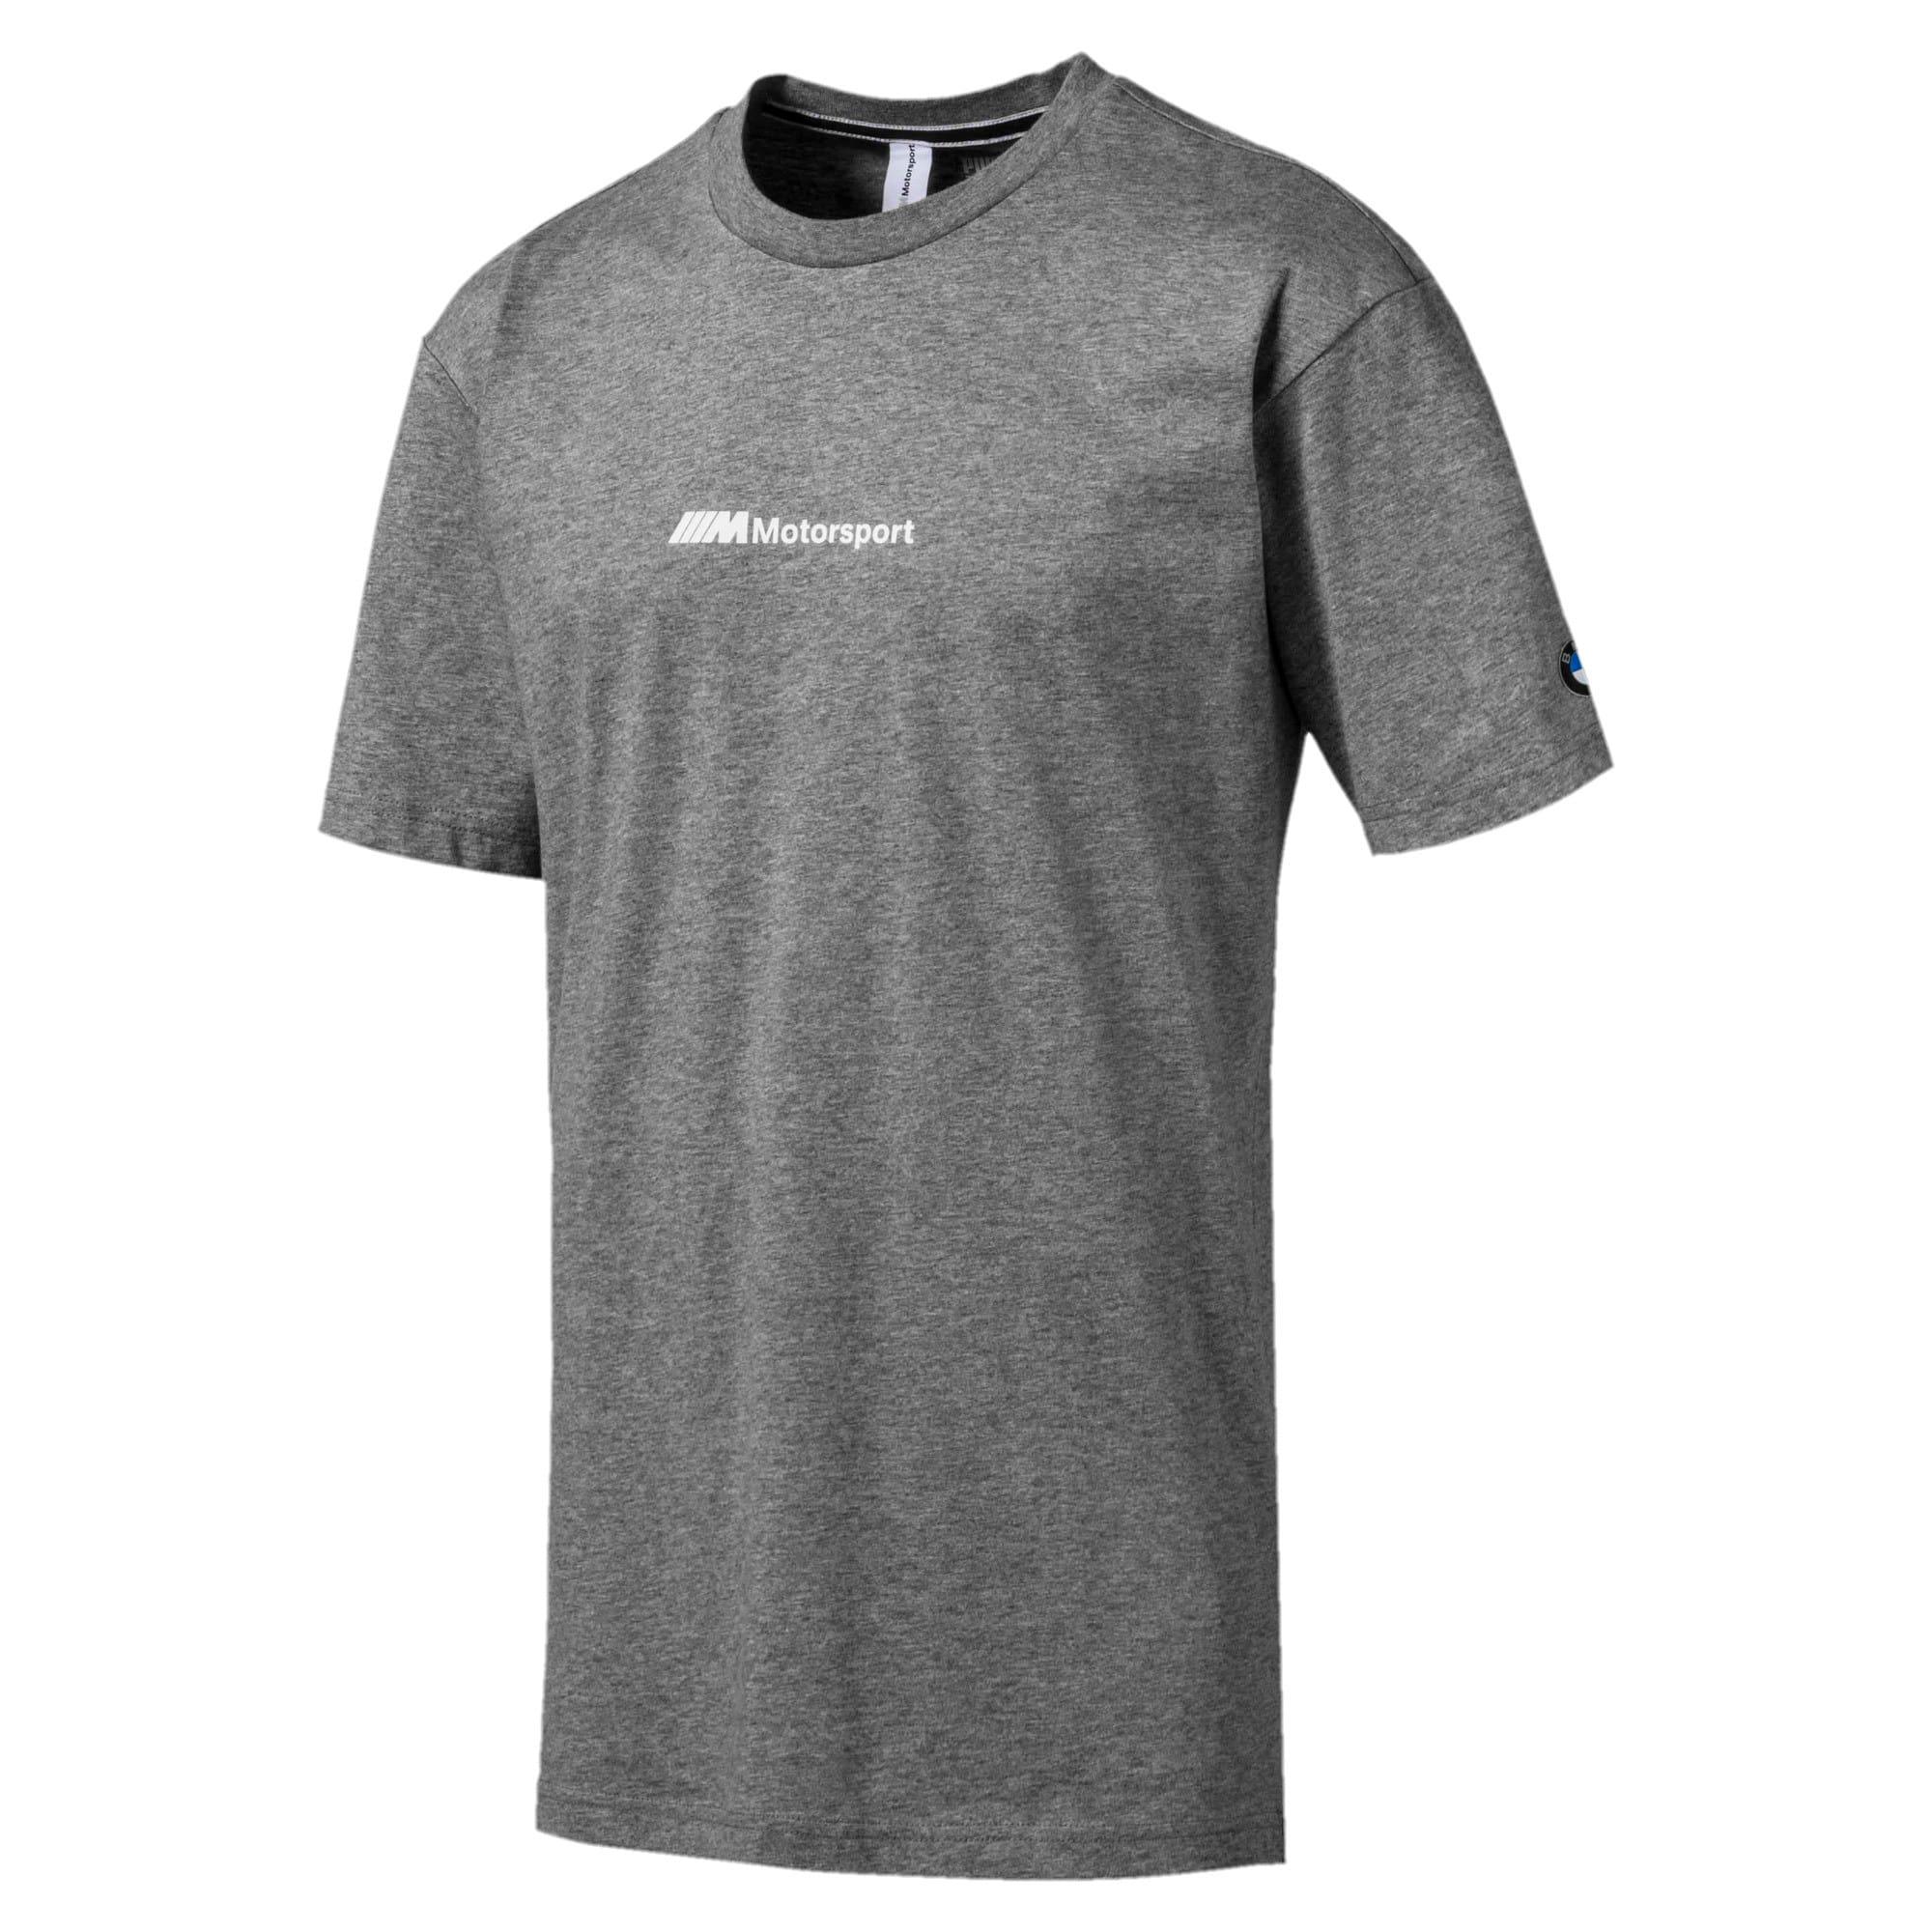 Miniatura 1 de Camiseta estampada BMW M Motorsport Street para hombre, Medium Gray Heather, mediano